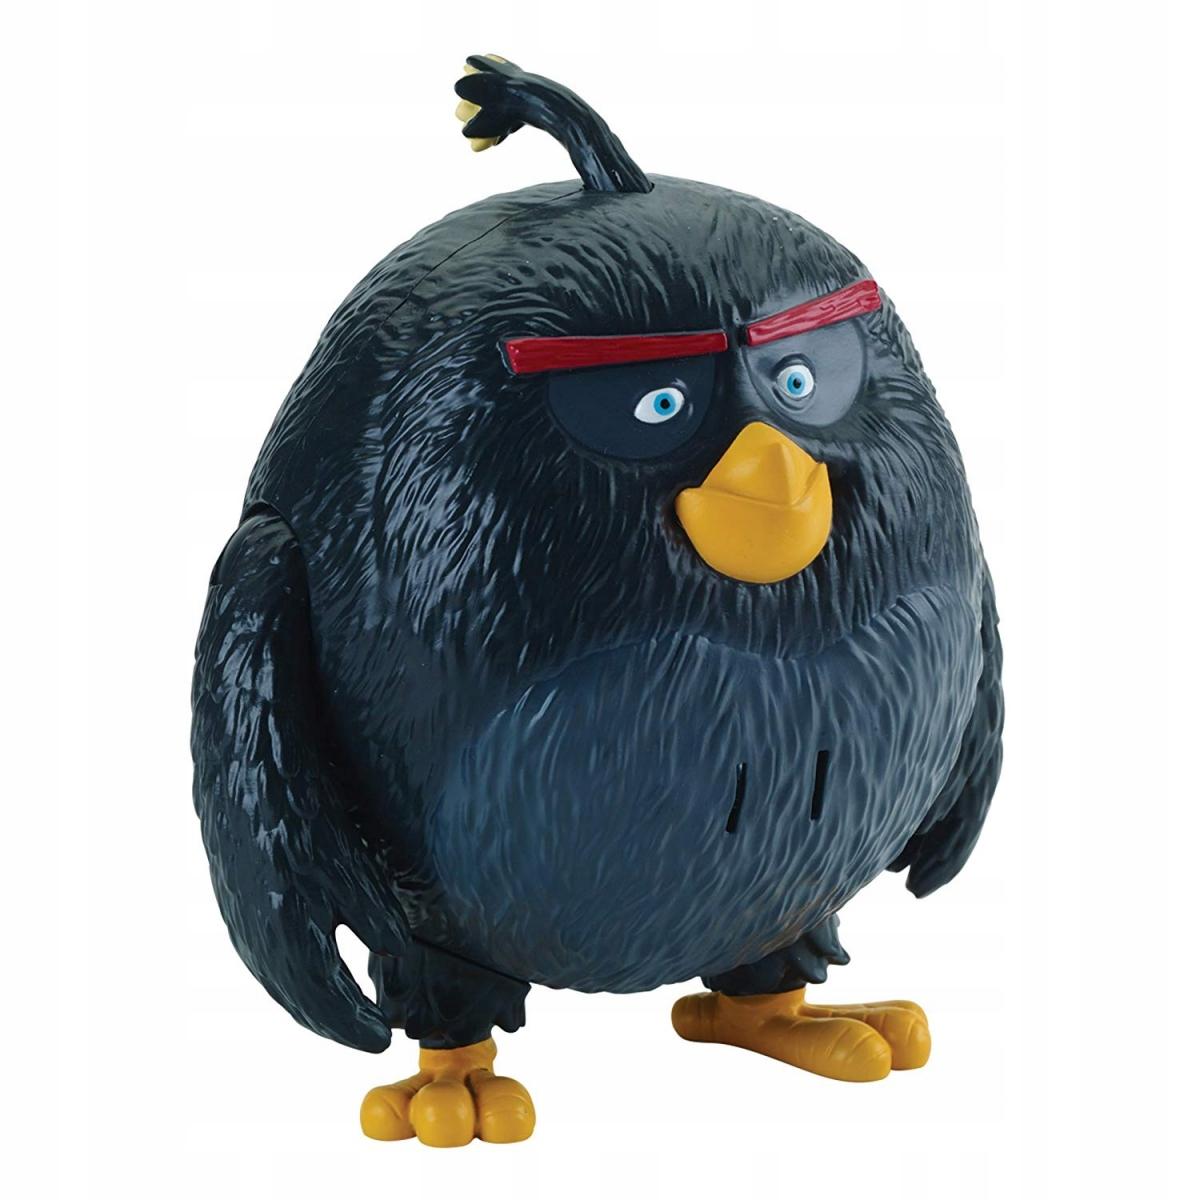 Angry Birds Bomba Figurka Interaktywna Dzwiek Ang 8665100793 Allegro Pl